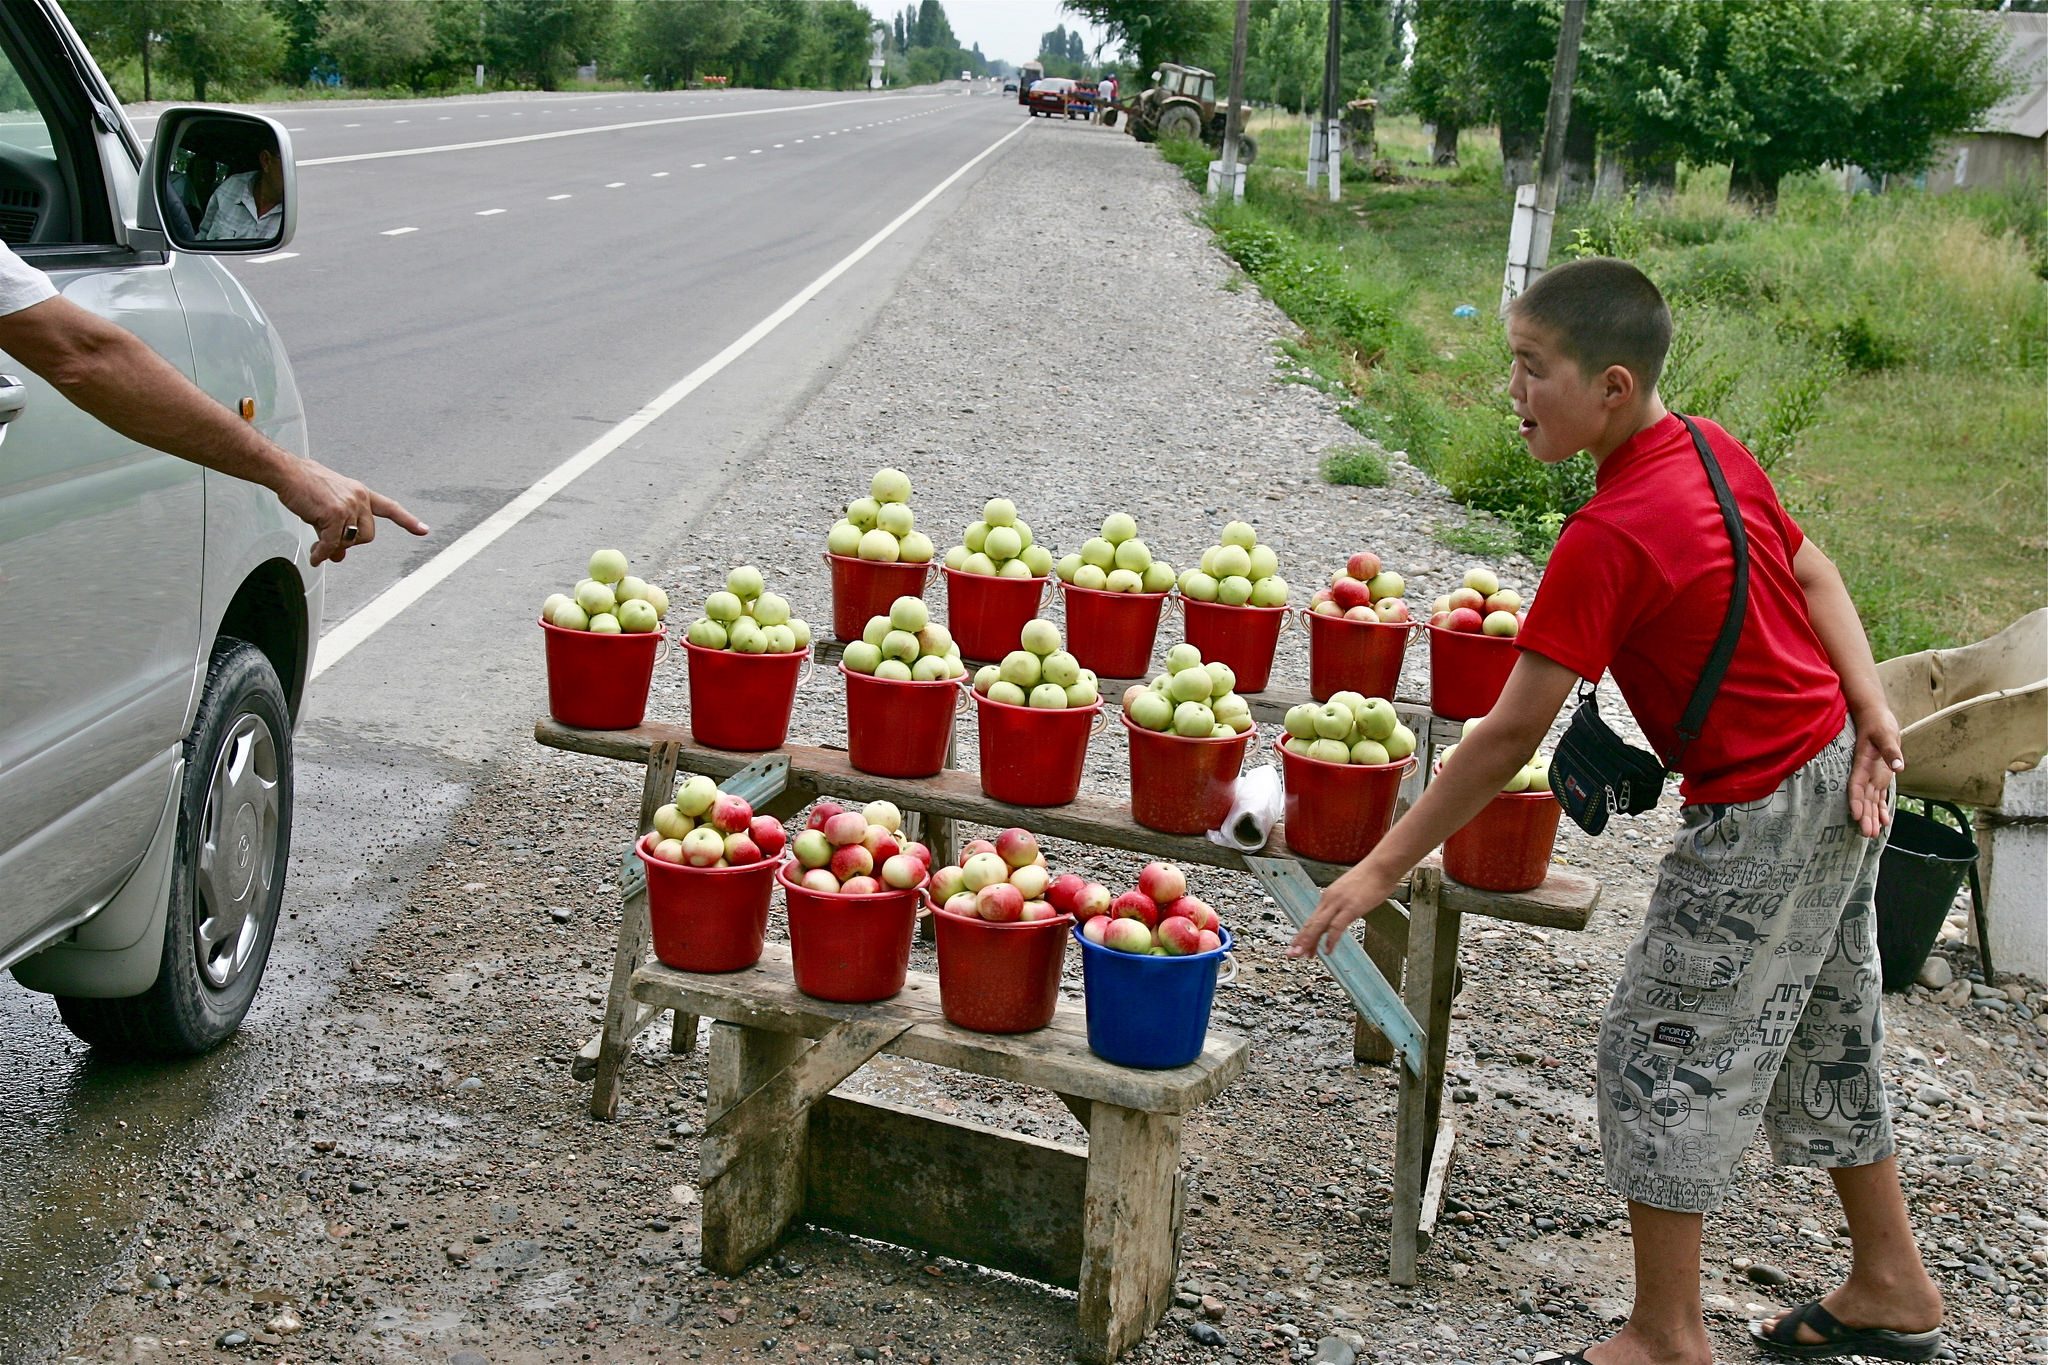 Apfelverkauf am Straßenrand Kirgistan